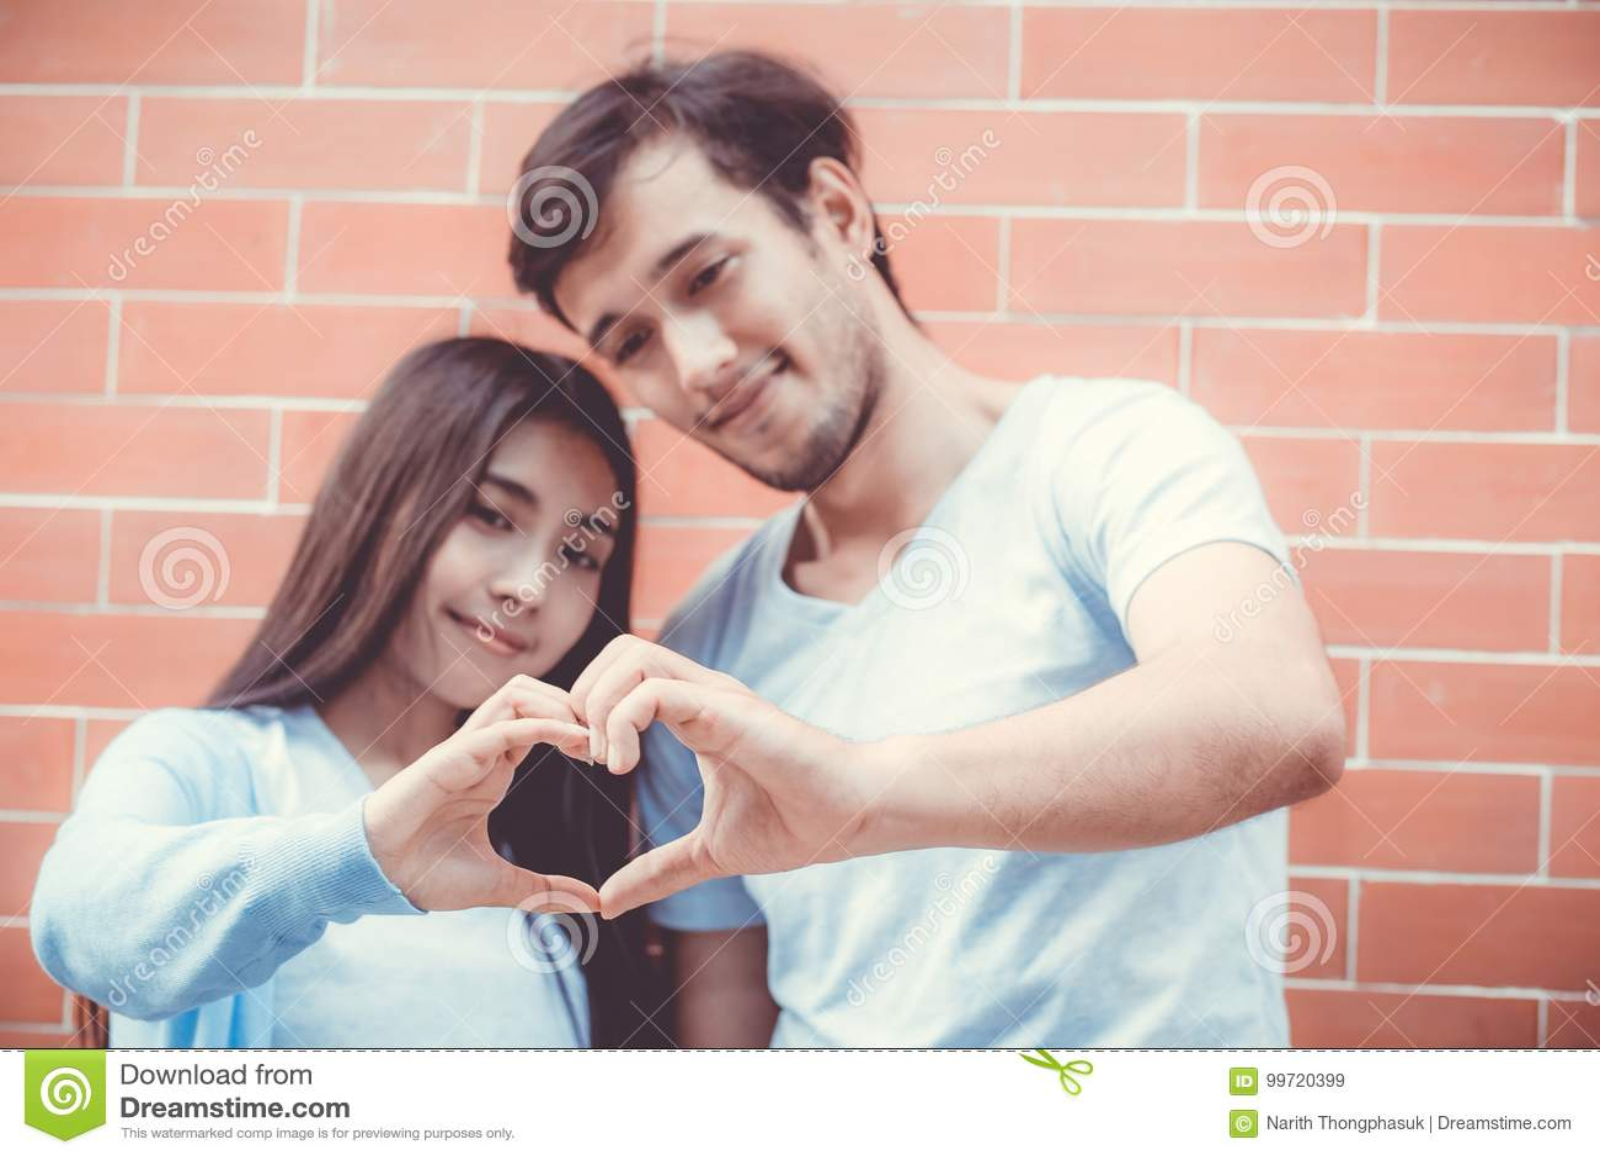 Asian women making love